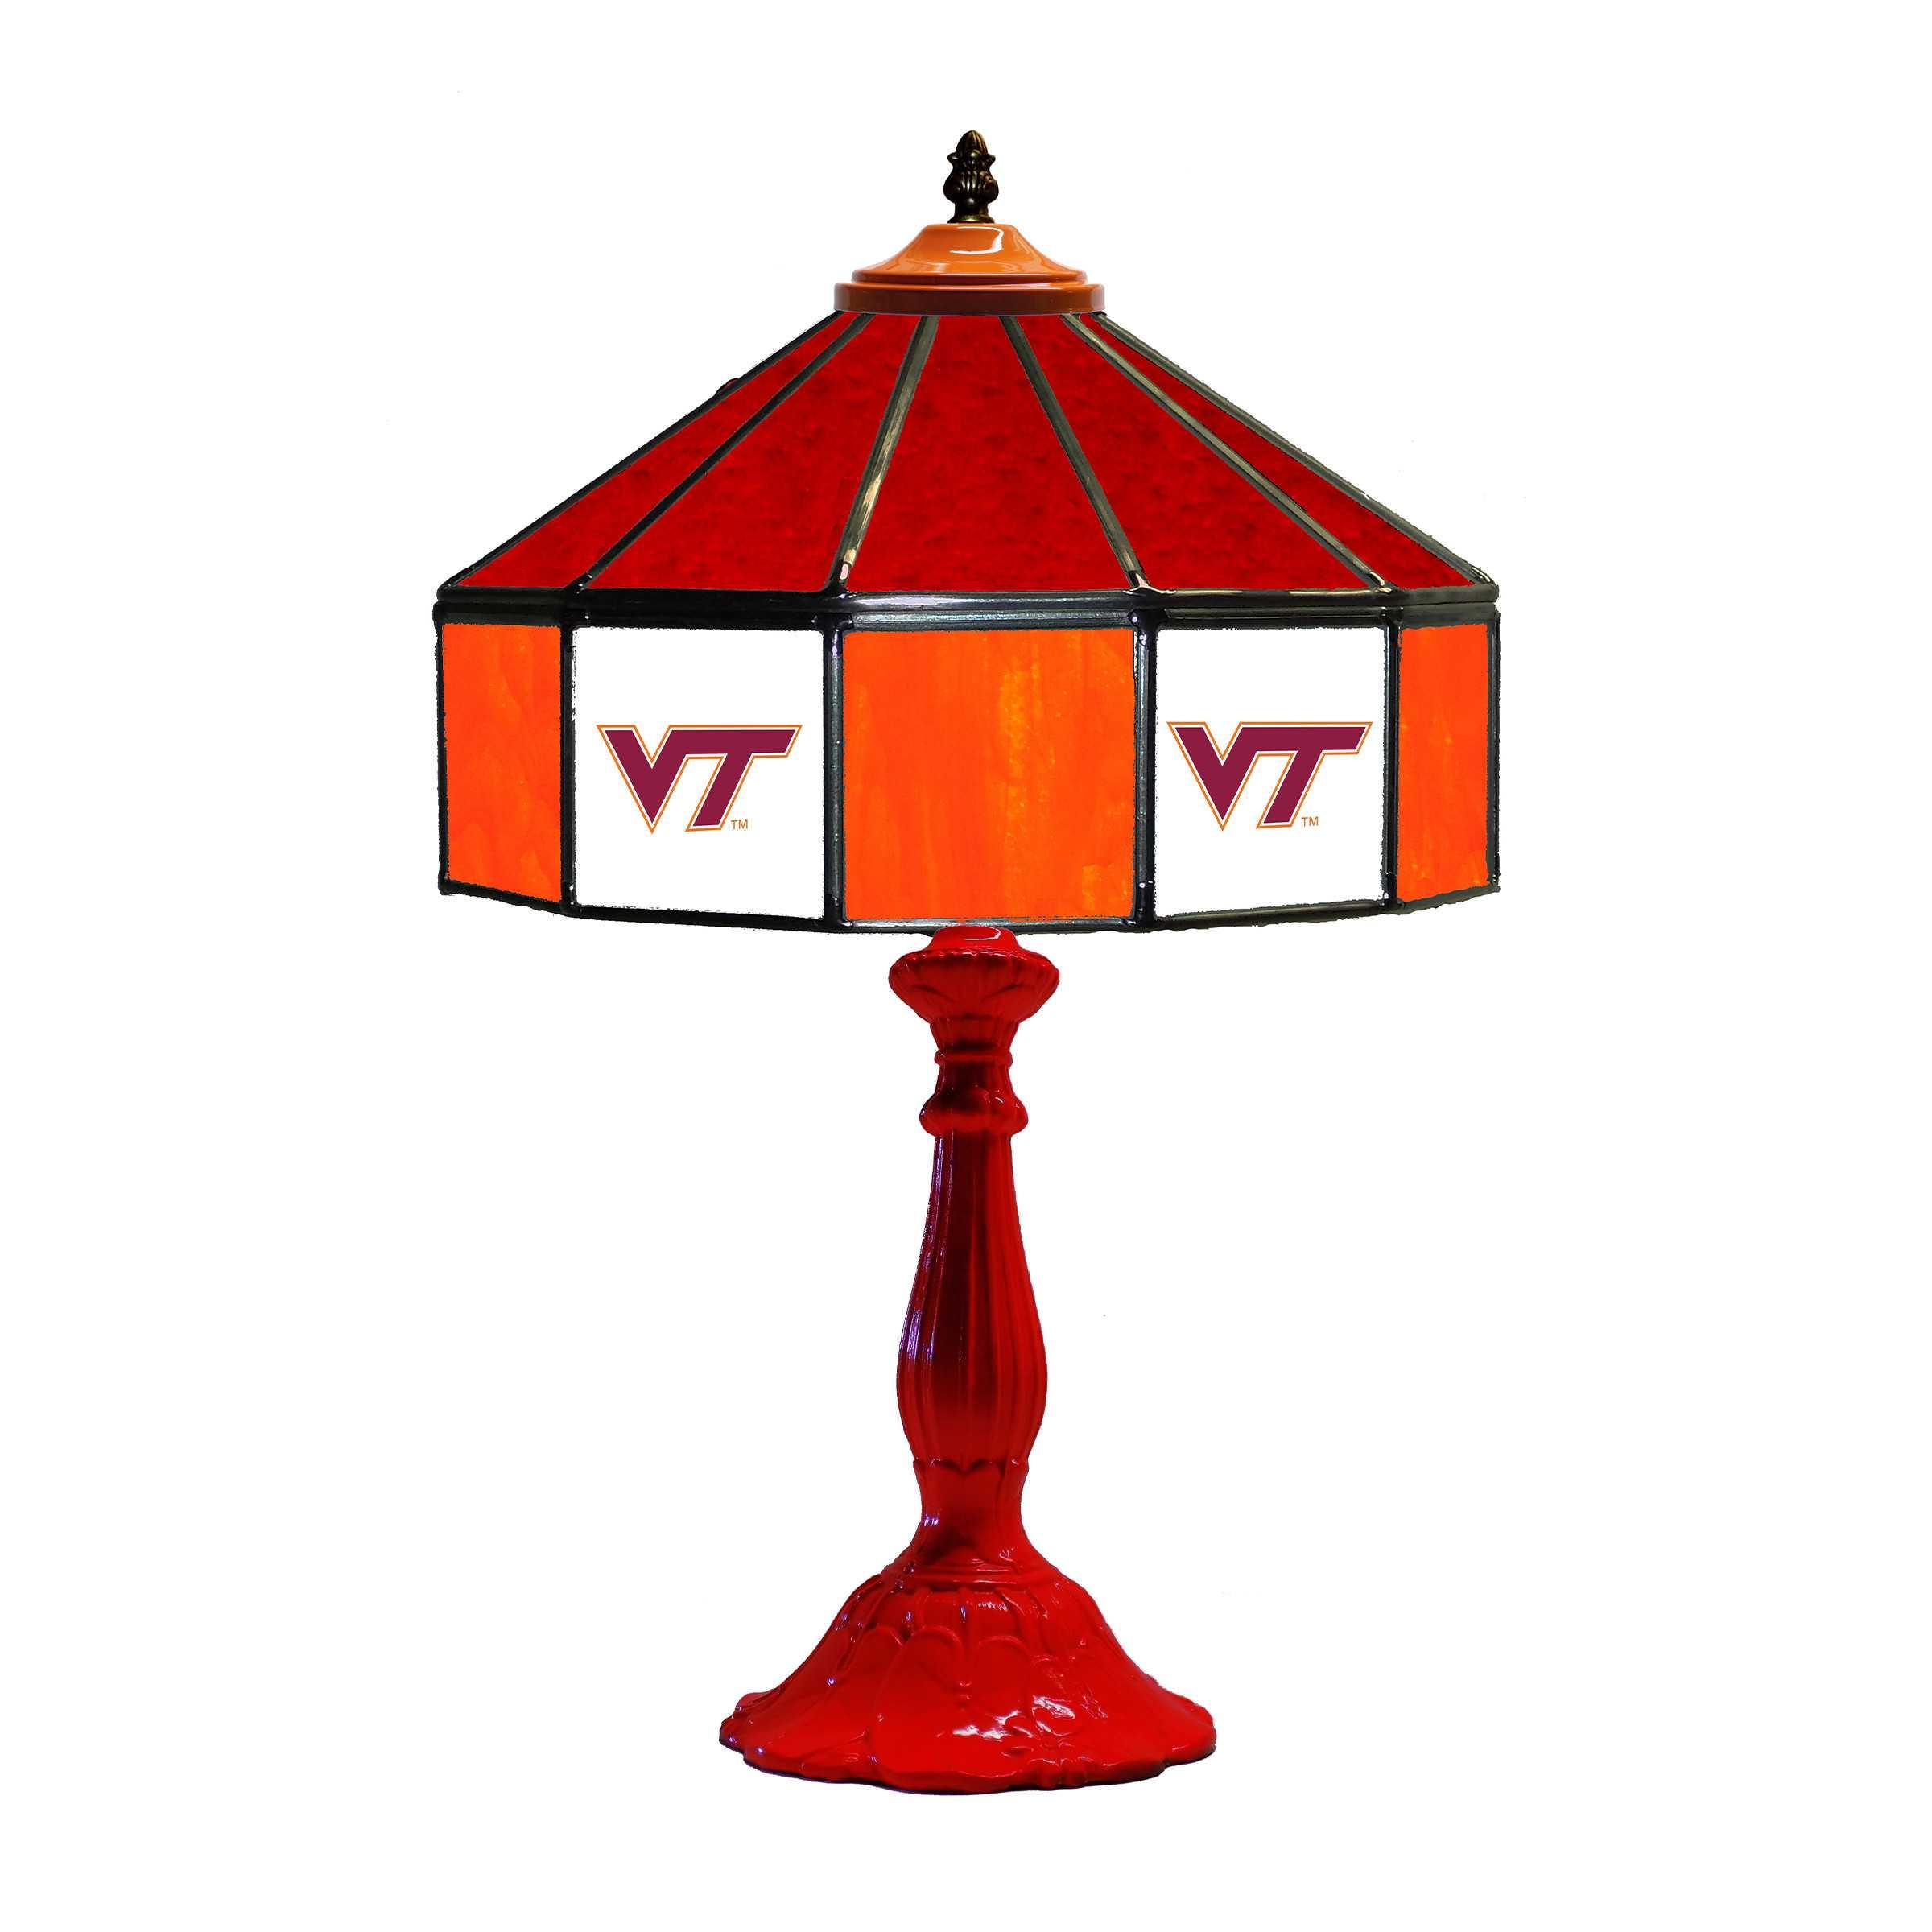 "VIRGINIA TECH HOKIES 21"" GLASS TABLE LAMP"